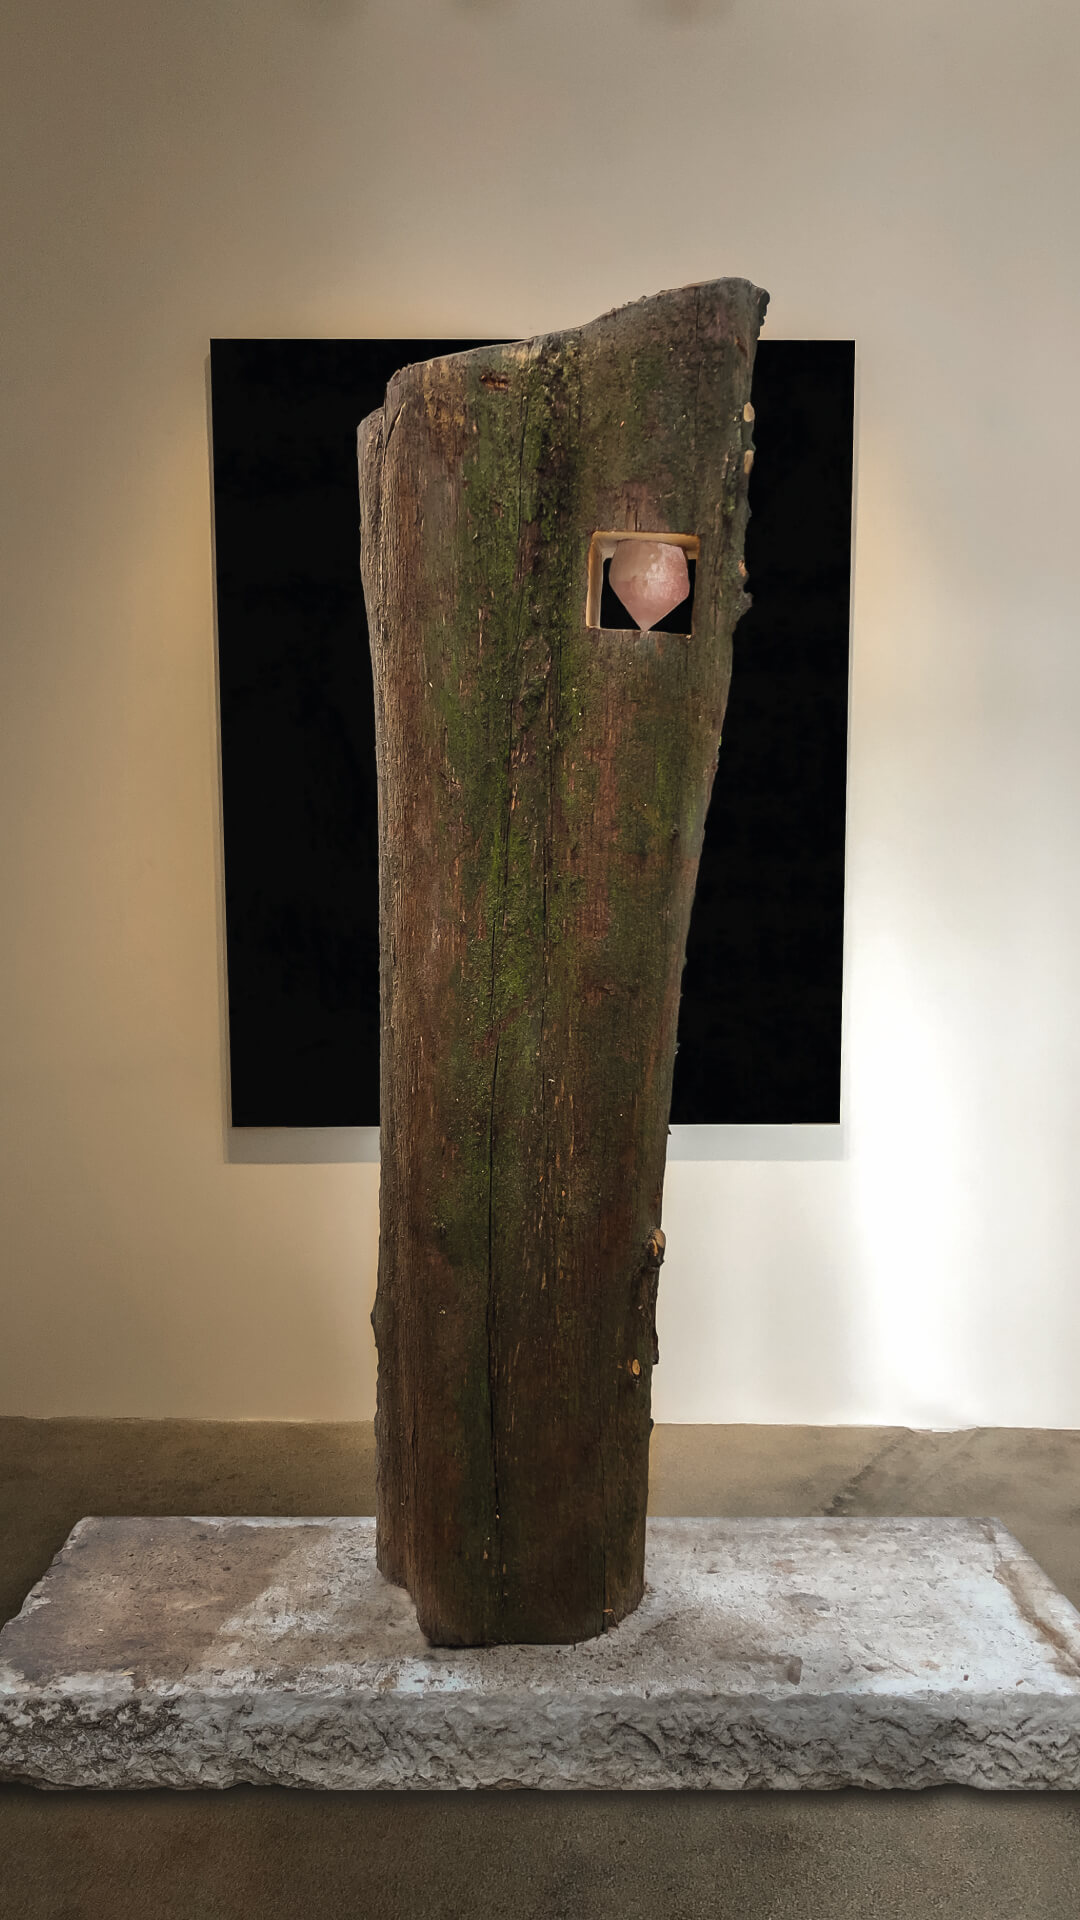 06-THERAW-THECOOKED-AARON-NACHTAILER-ART-ARTIST-CRYSTALS-SCULPTURES-VERTICAL